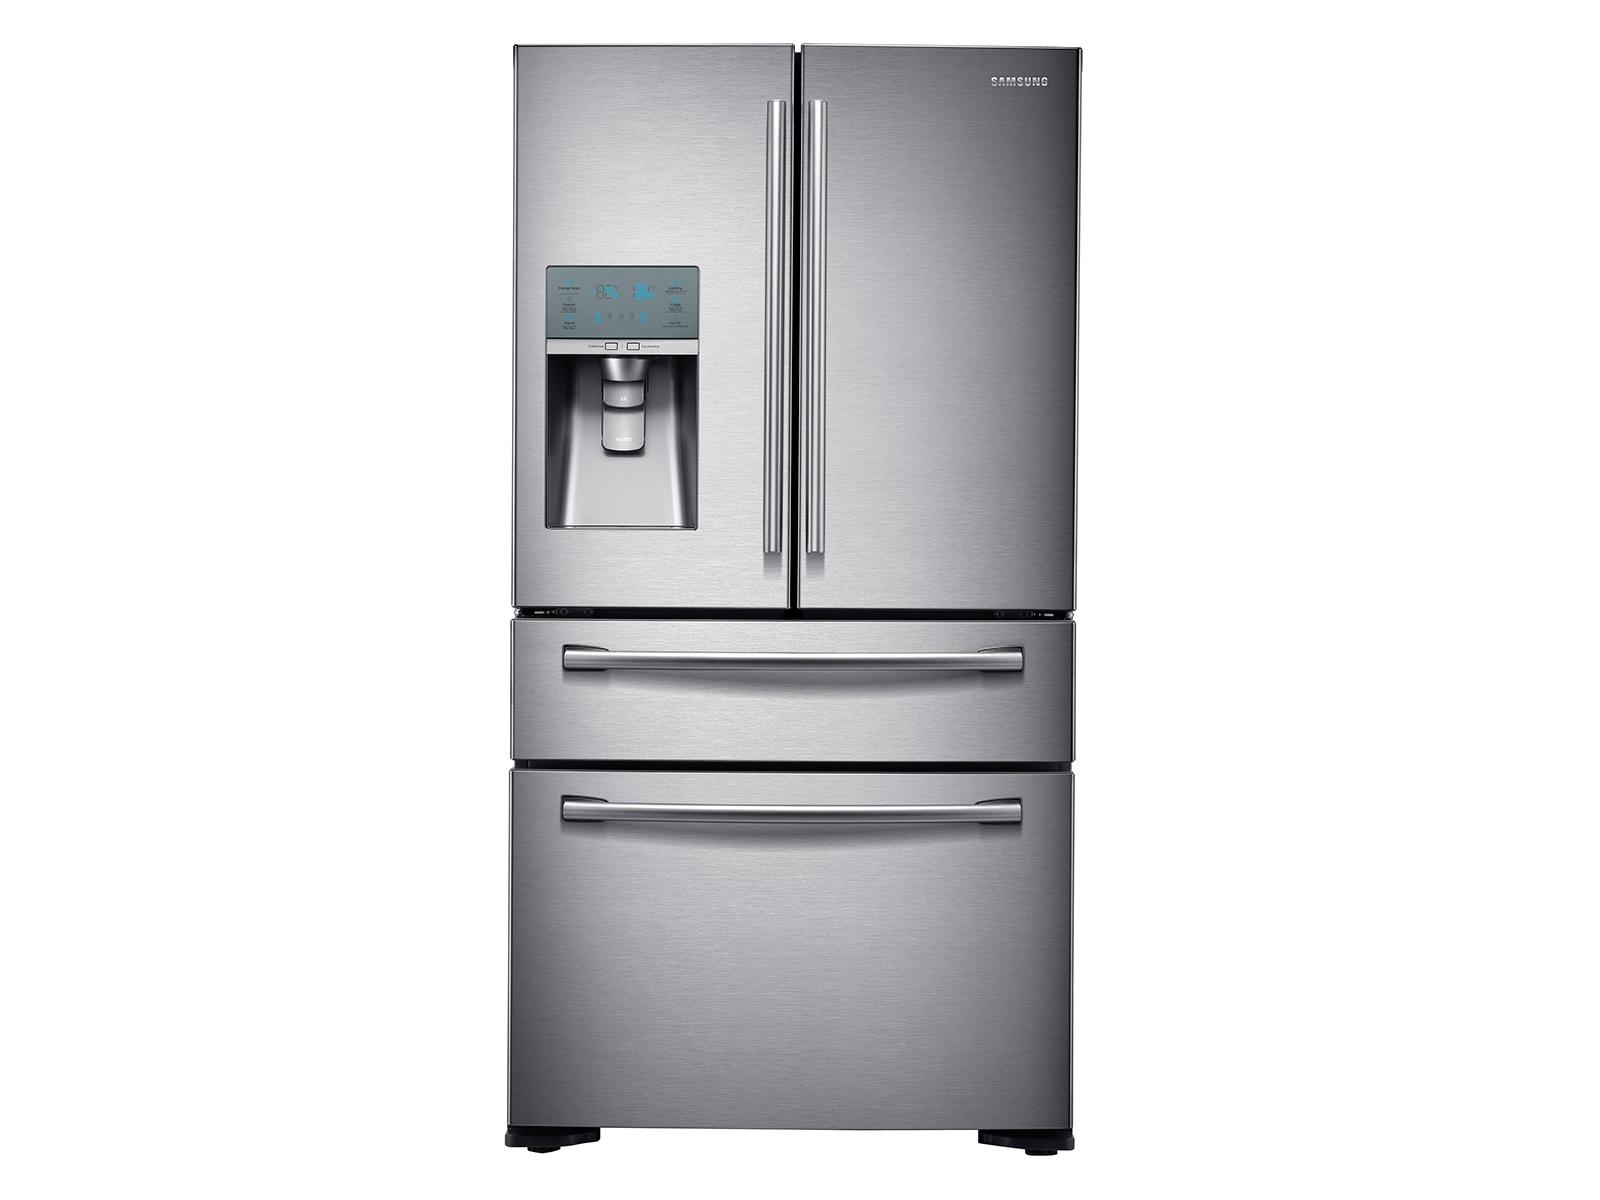 23 cu. ft. Counter Depth 4-Door Refrigerator with FlexZone Drawer in Stainless Steel